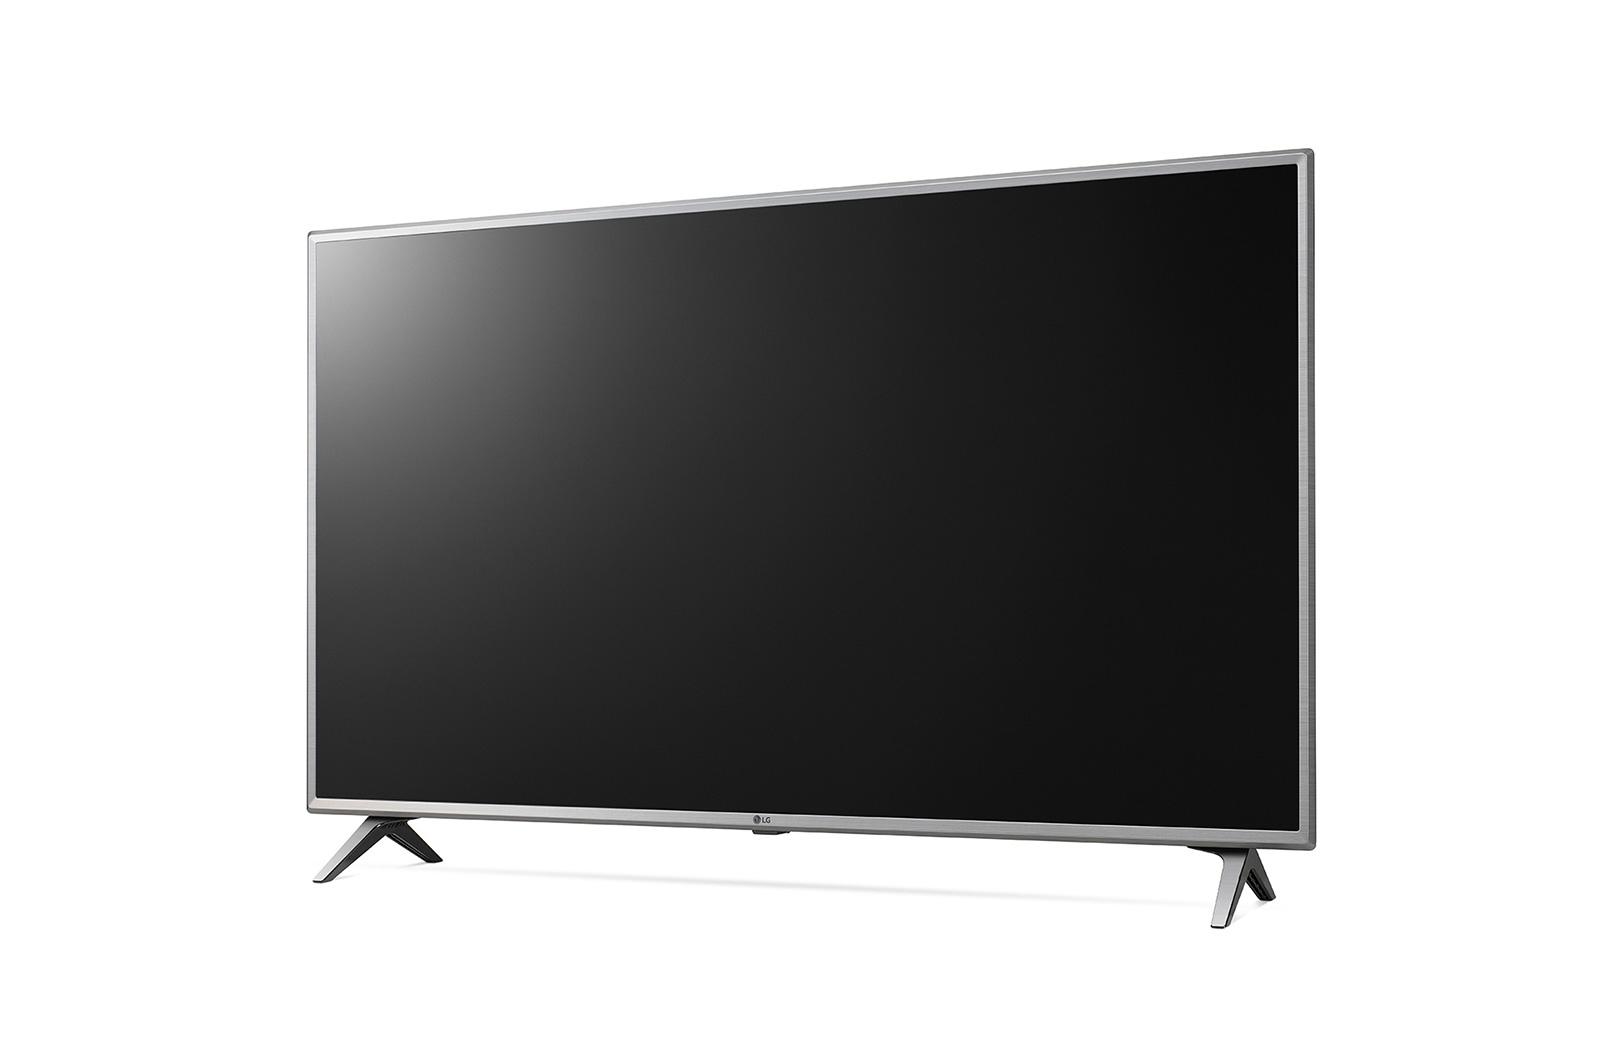 b9dda0a68 LG 50UK6500PLA LED TV 127 cm (50